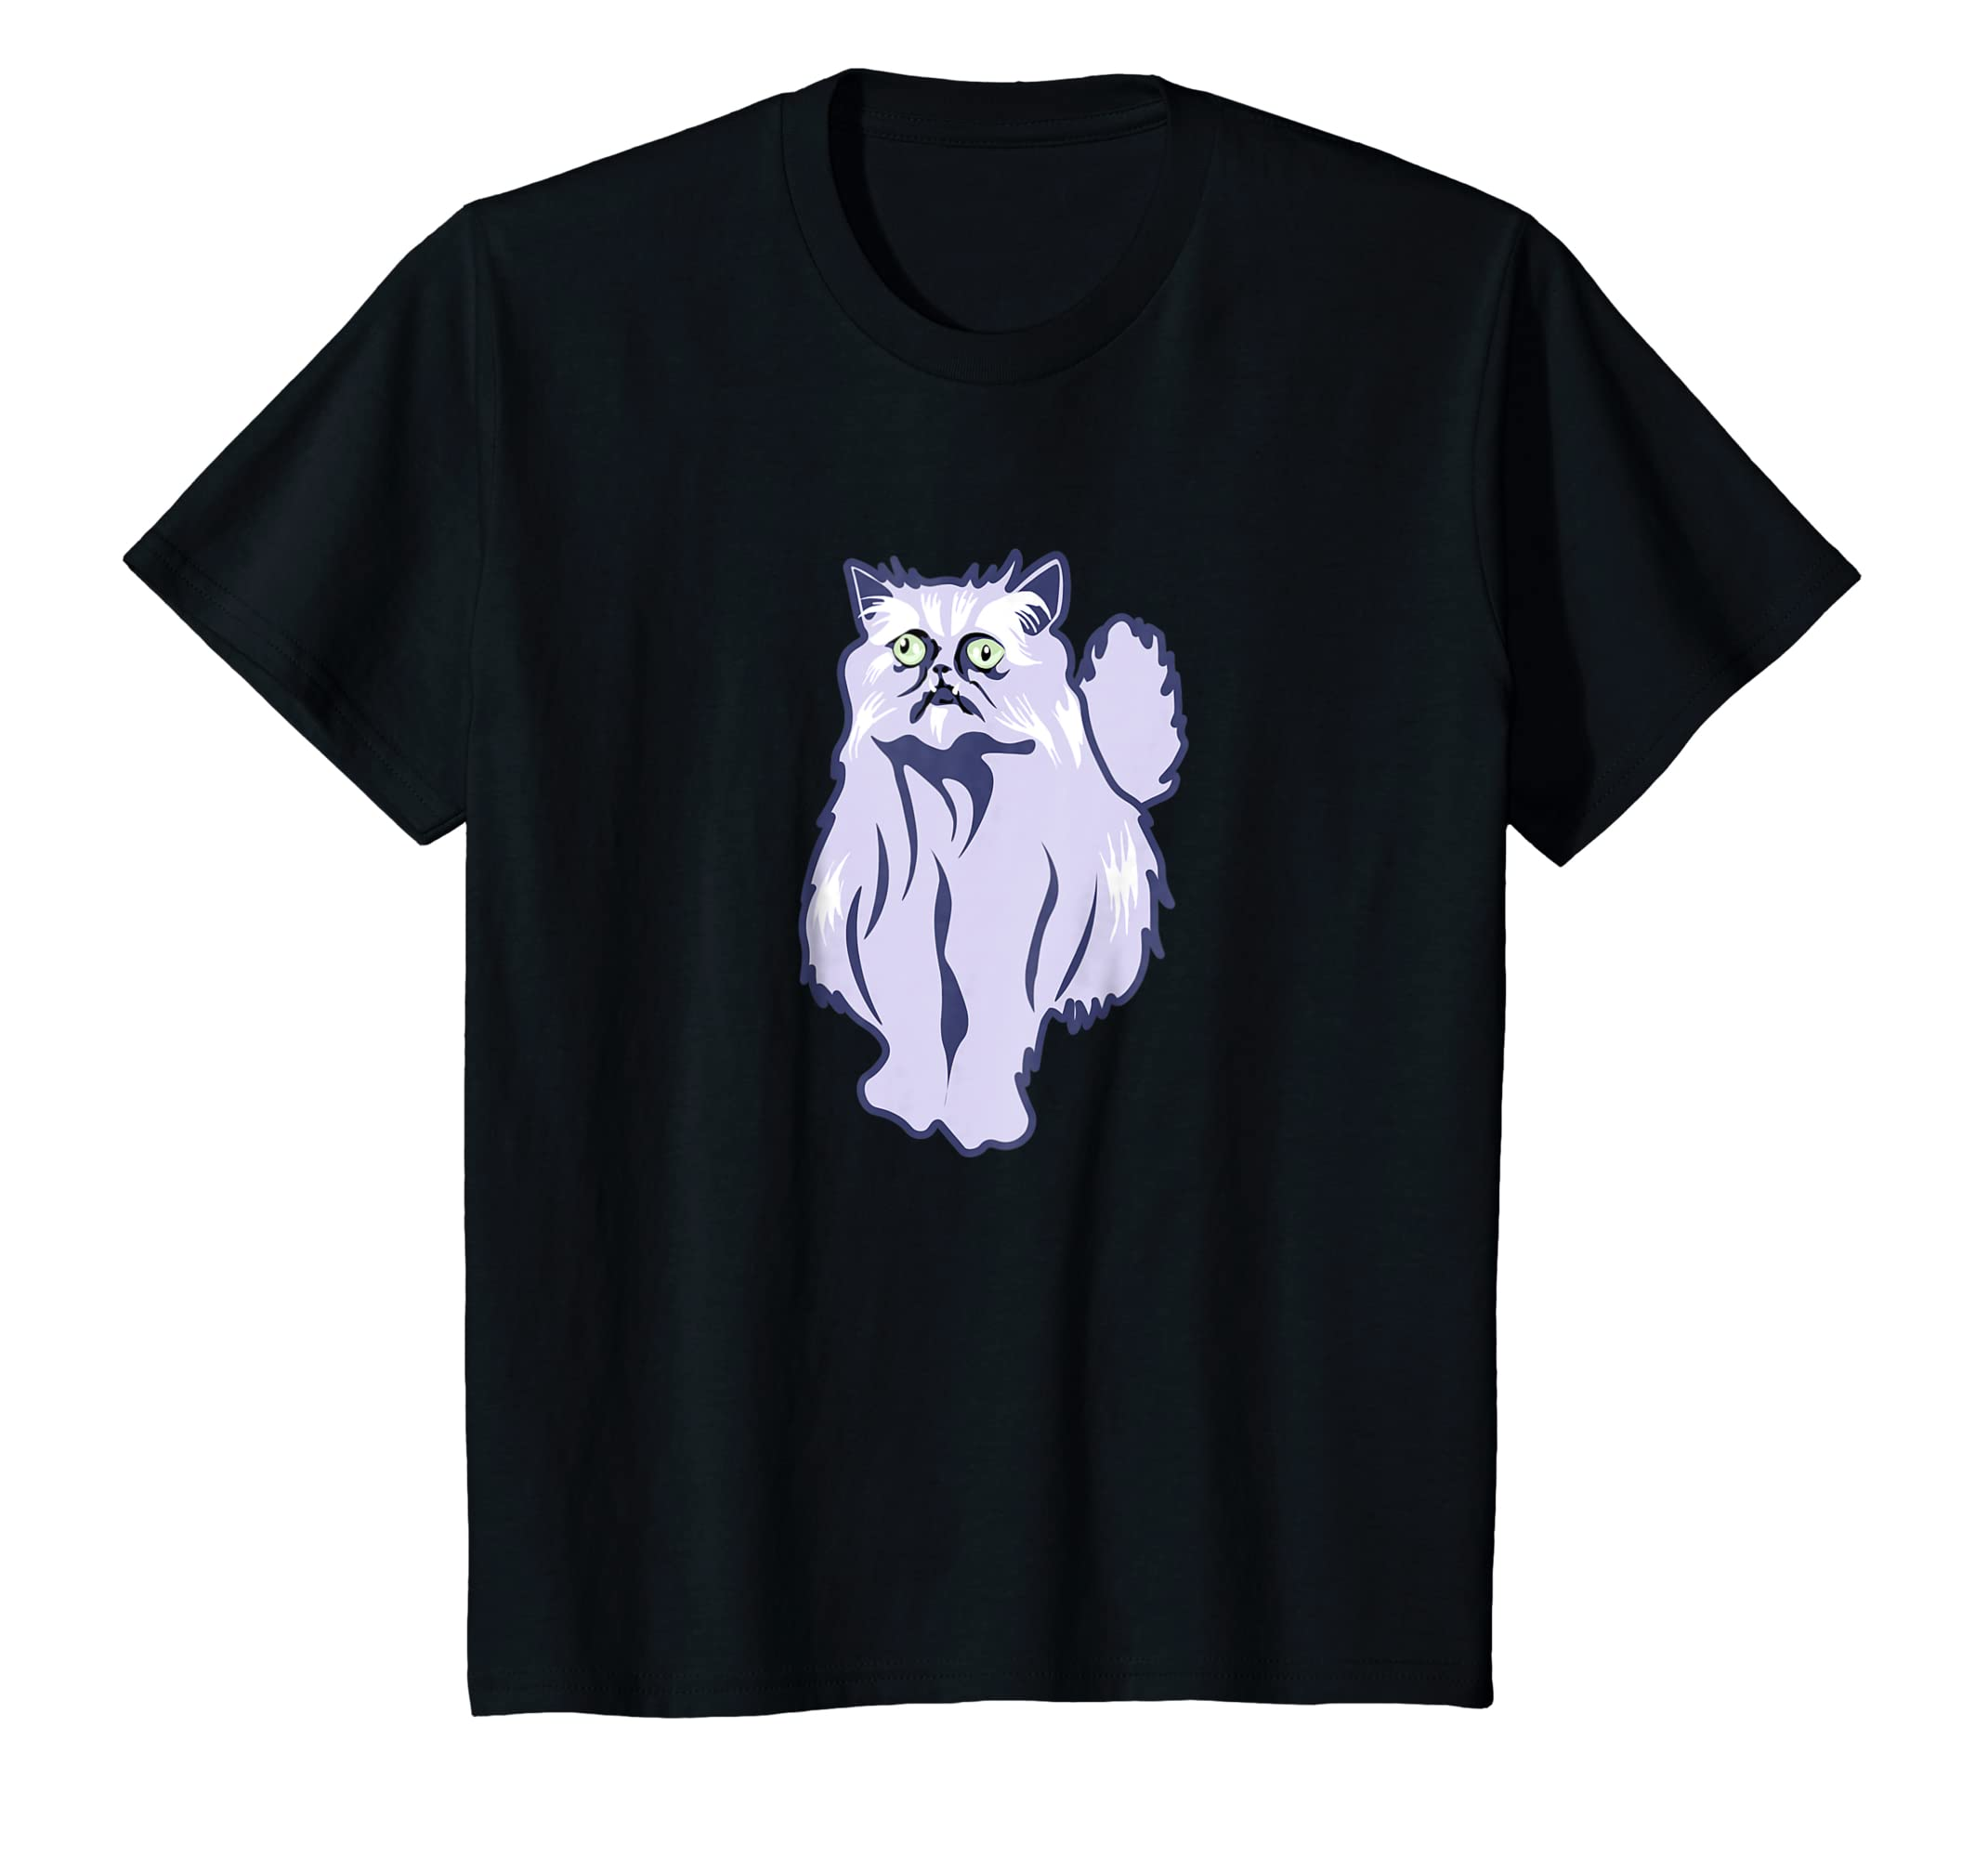 27896a5bb Amazon.com: Ma We Gotta Weird Cat Outside T-Shirt: Clothing